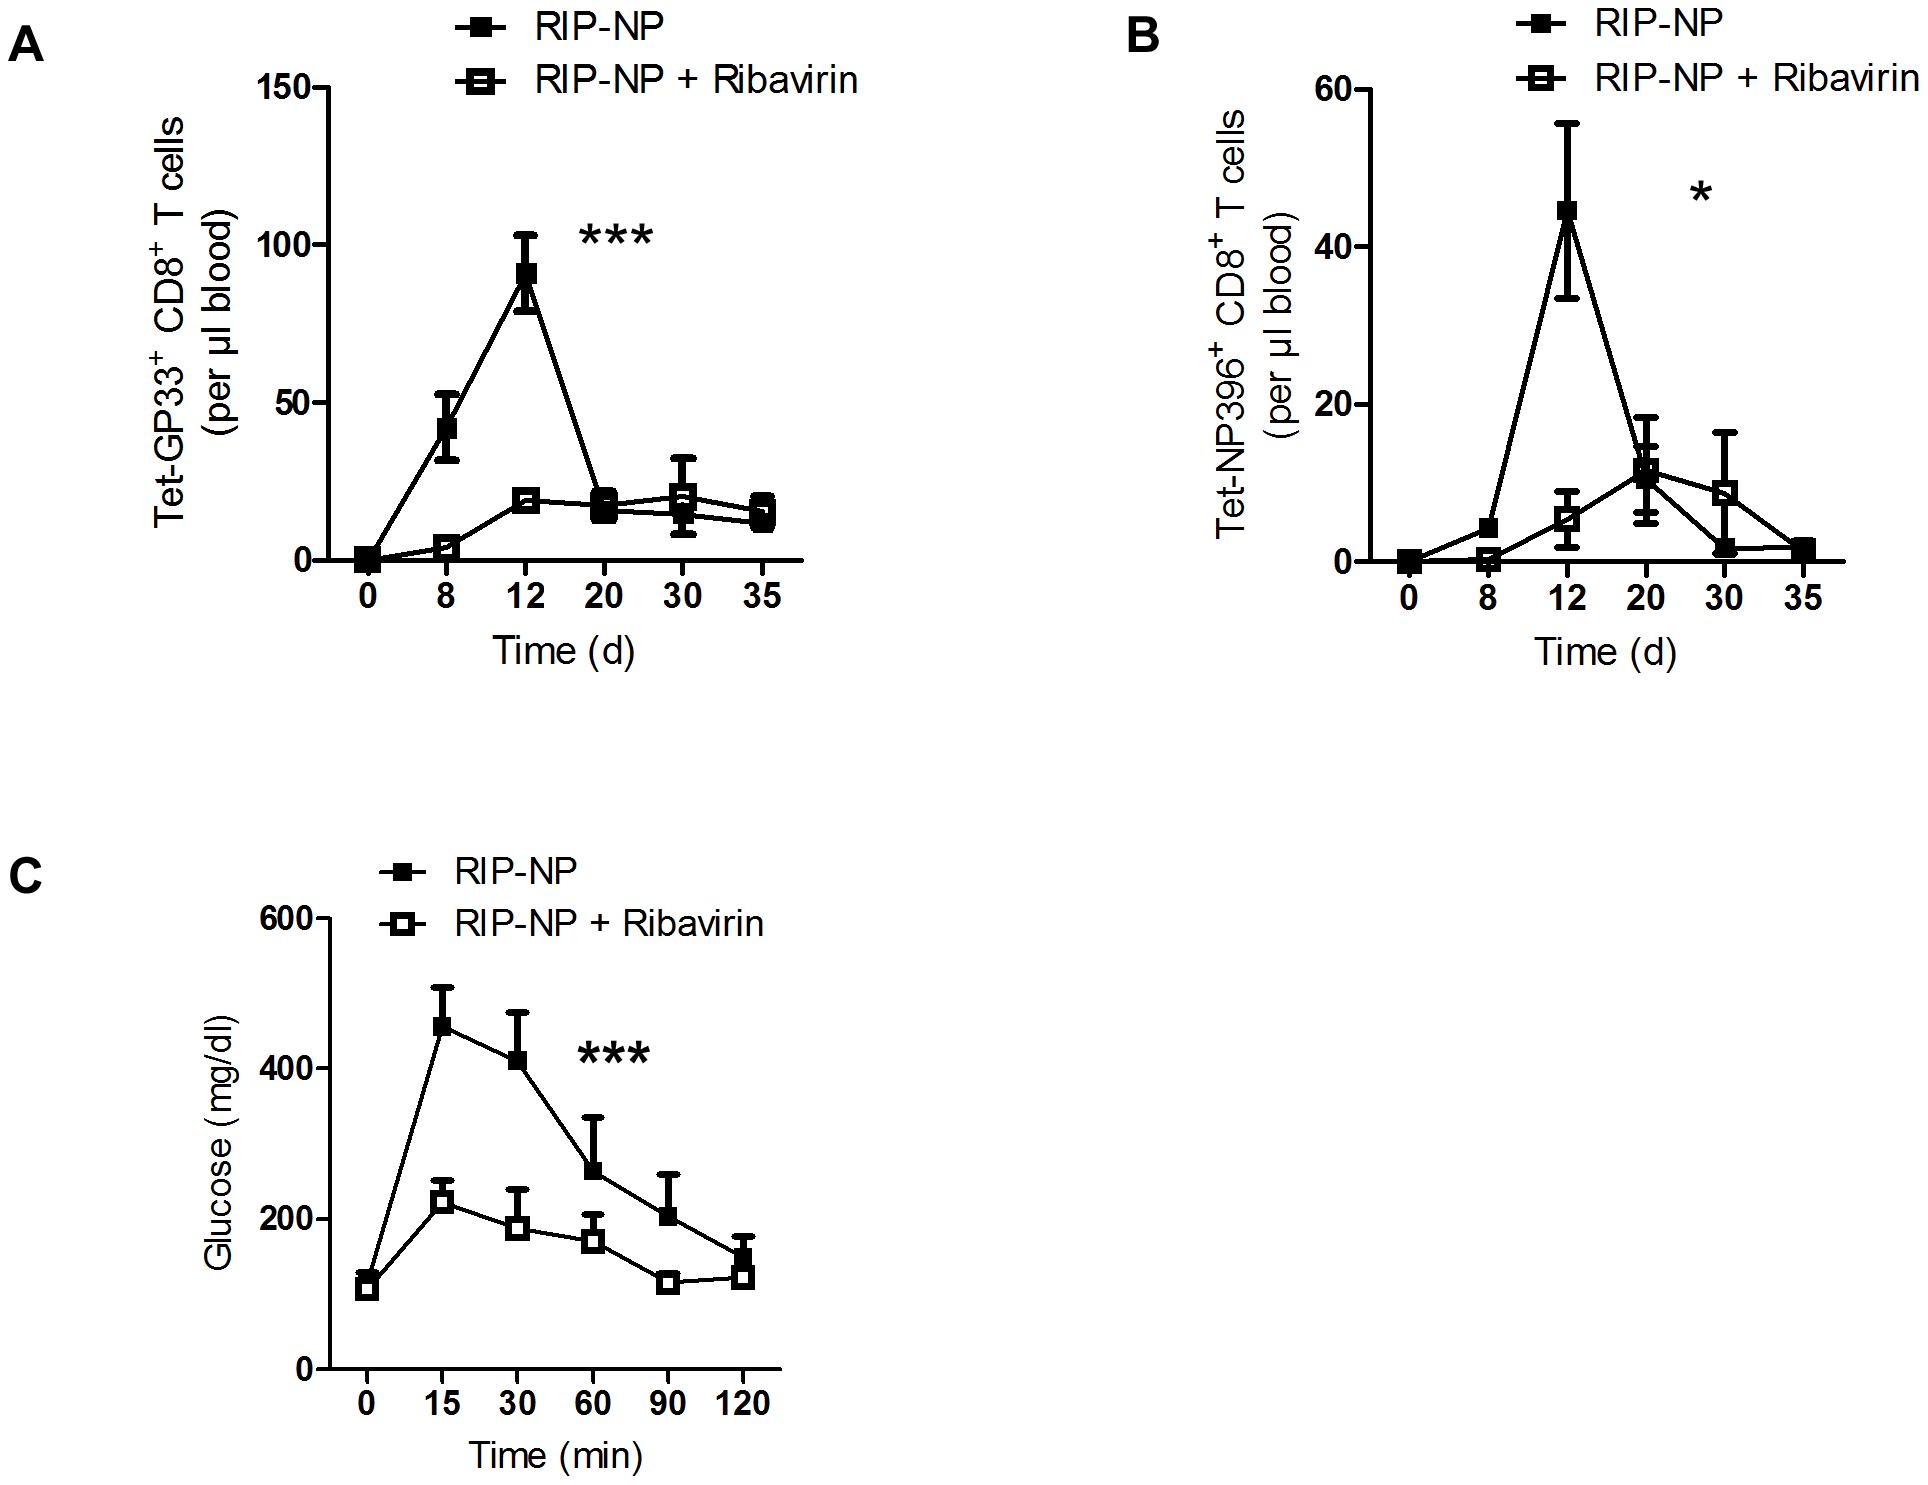 Ribavirin blunts auto-reactivity in RIP-NP diabetes model.